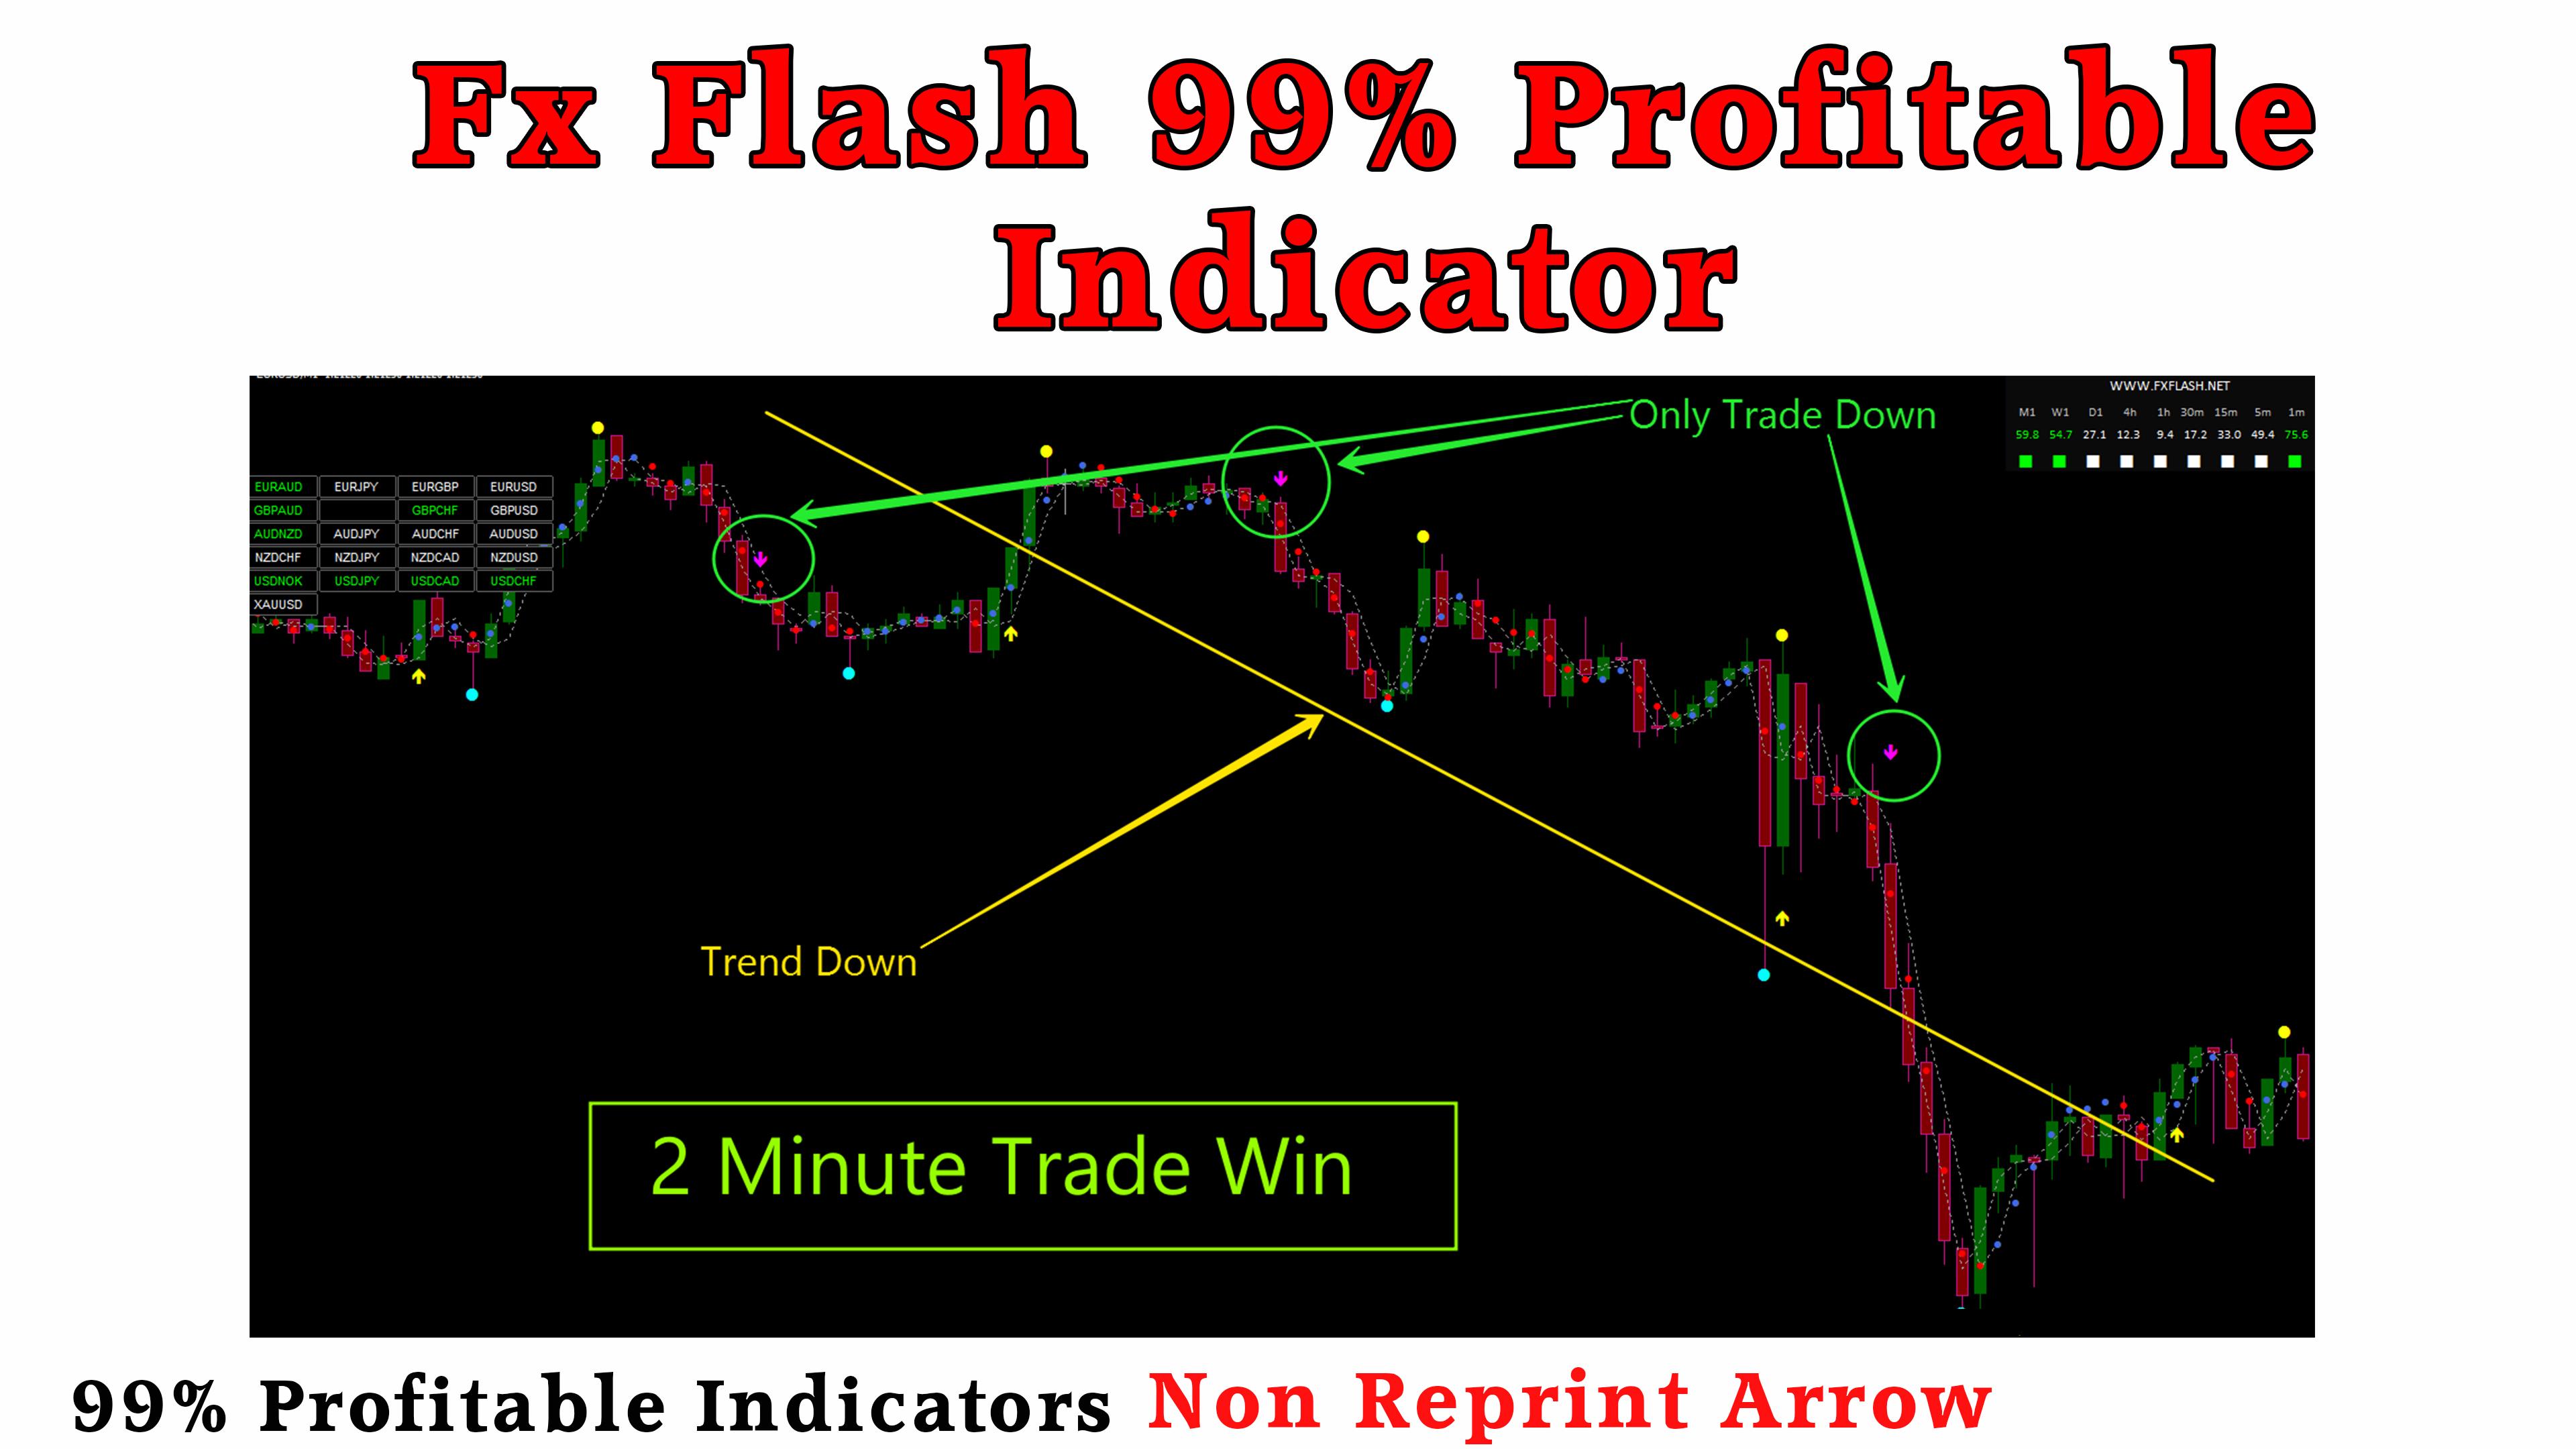 Fx Flash Uniq 2021 MT4 Indicator 2 Minute Trading On IQ Option 99 Profitable